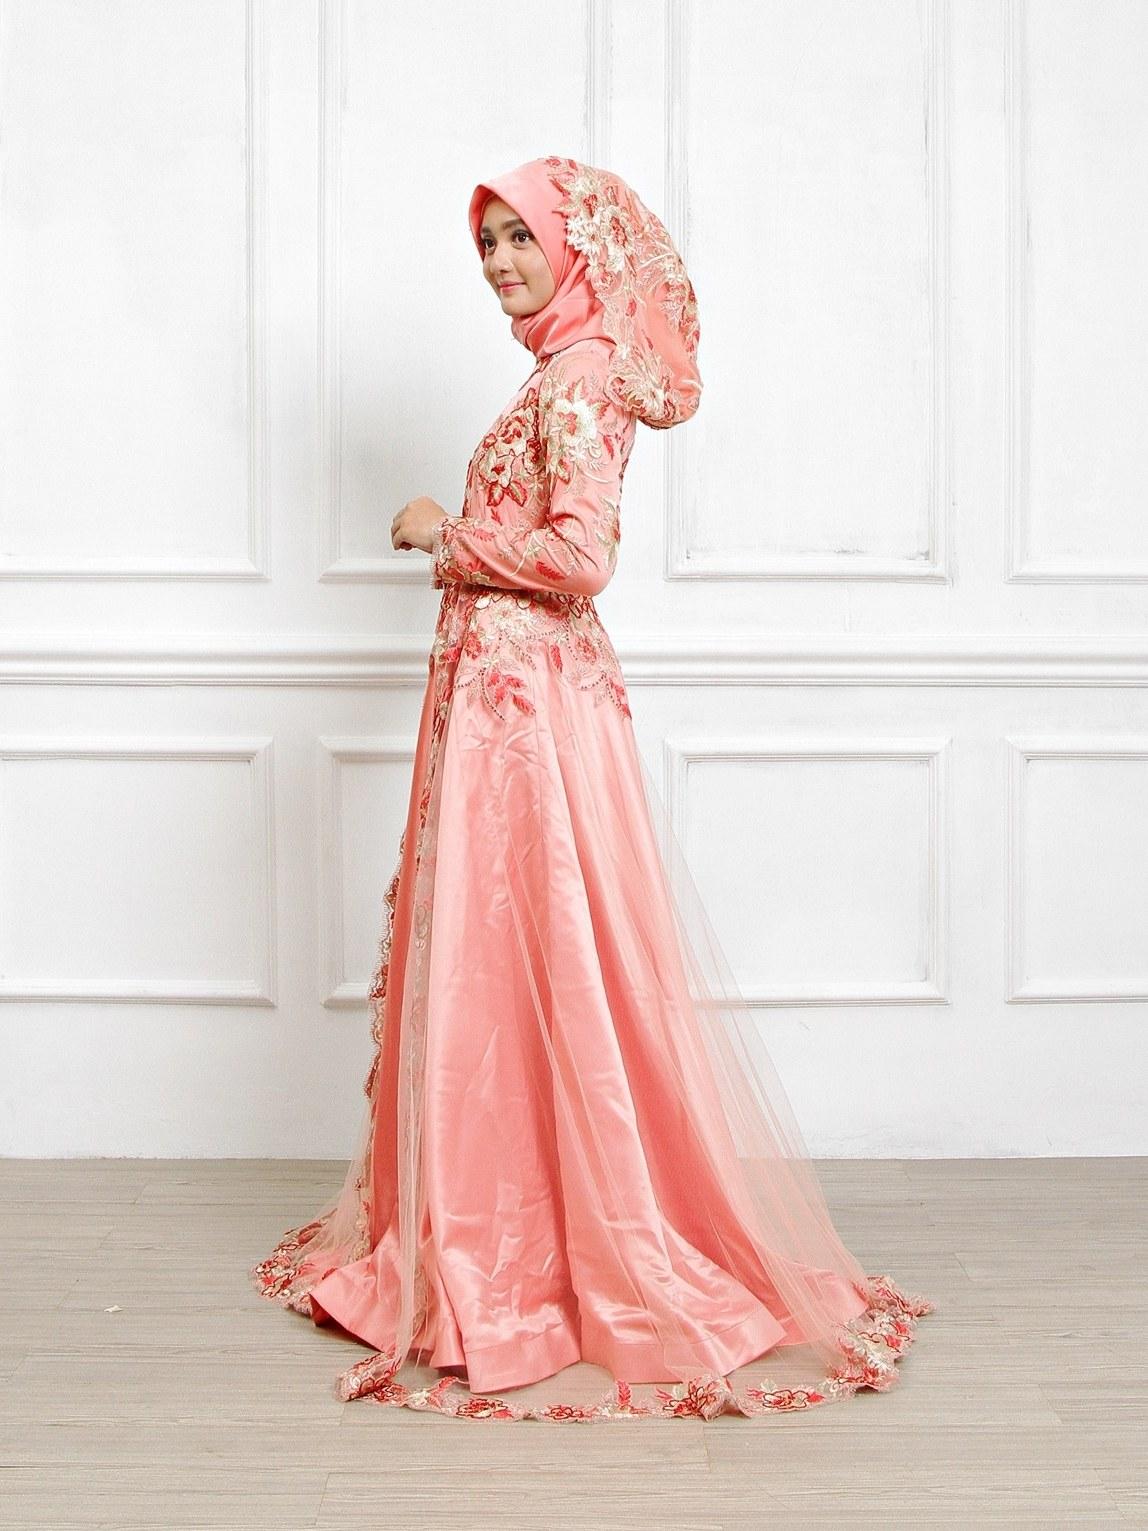 Bentuk Sewa Gaun Pengantin Muslimah Di solo 87dx Gaun Pengantin Muslimah Dress Muslim Pungky Rumah Jahit